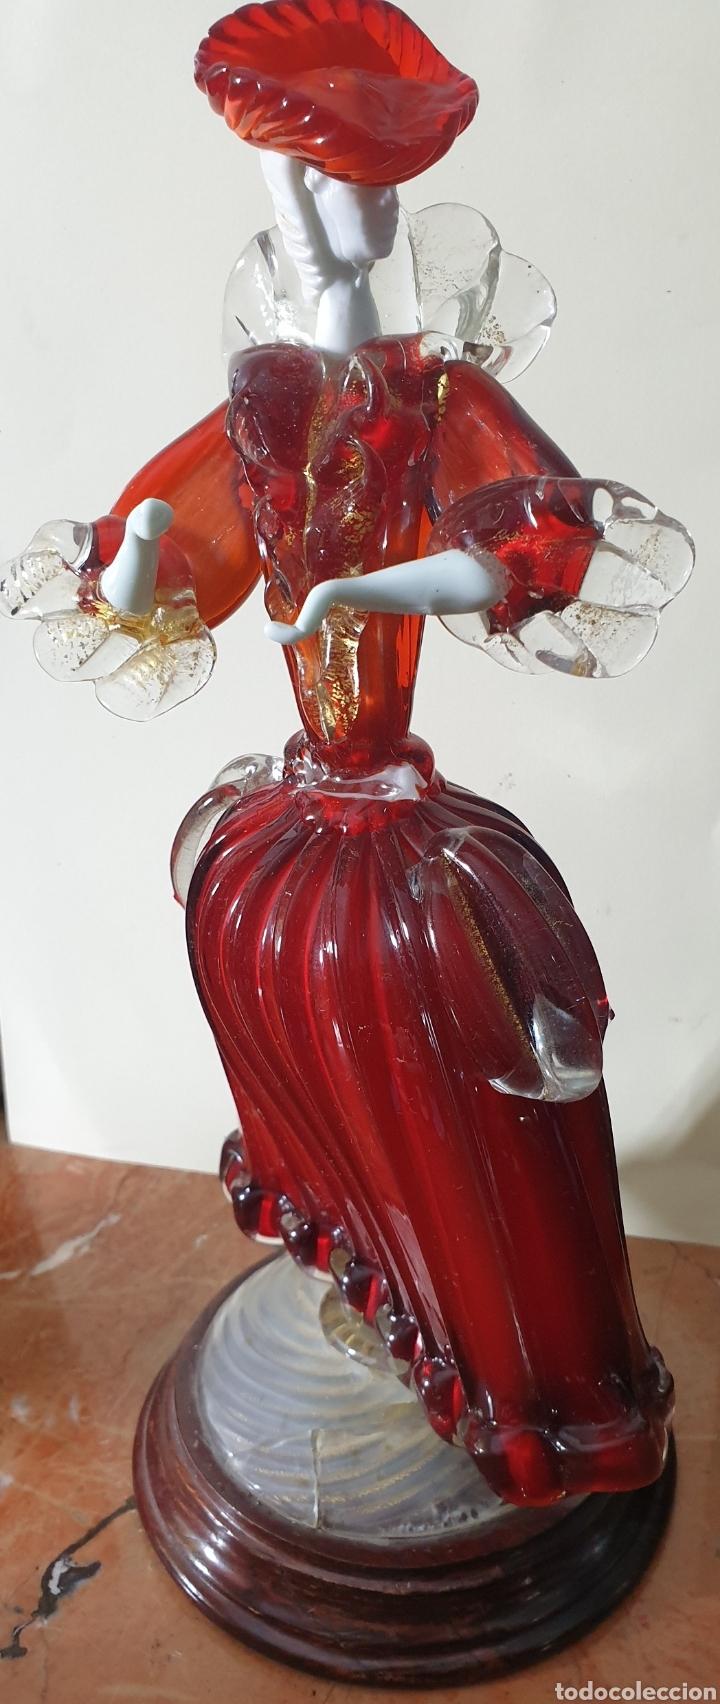 Antigüedades: Bonita pareja de cristal de murano de mediados o principios sigloXIX - Foto 8 - 261983620